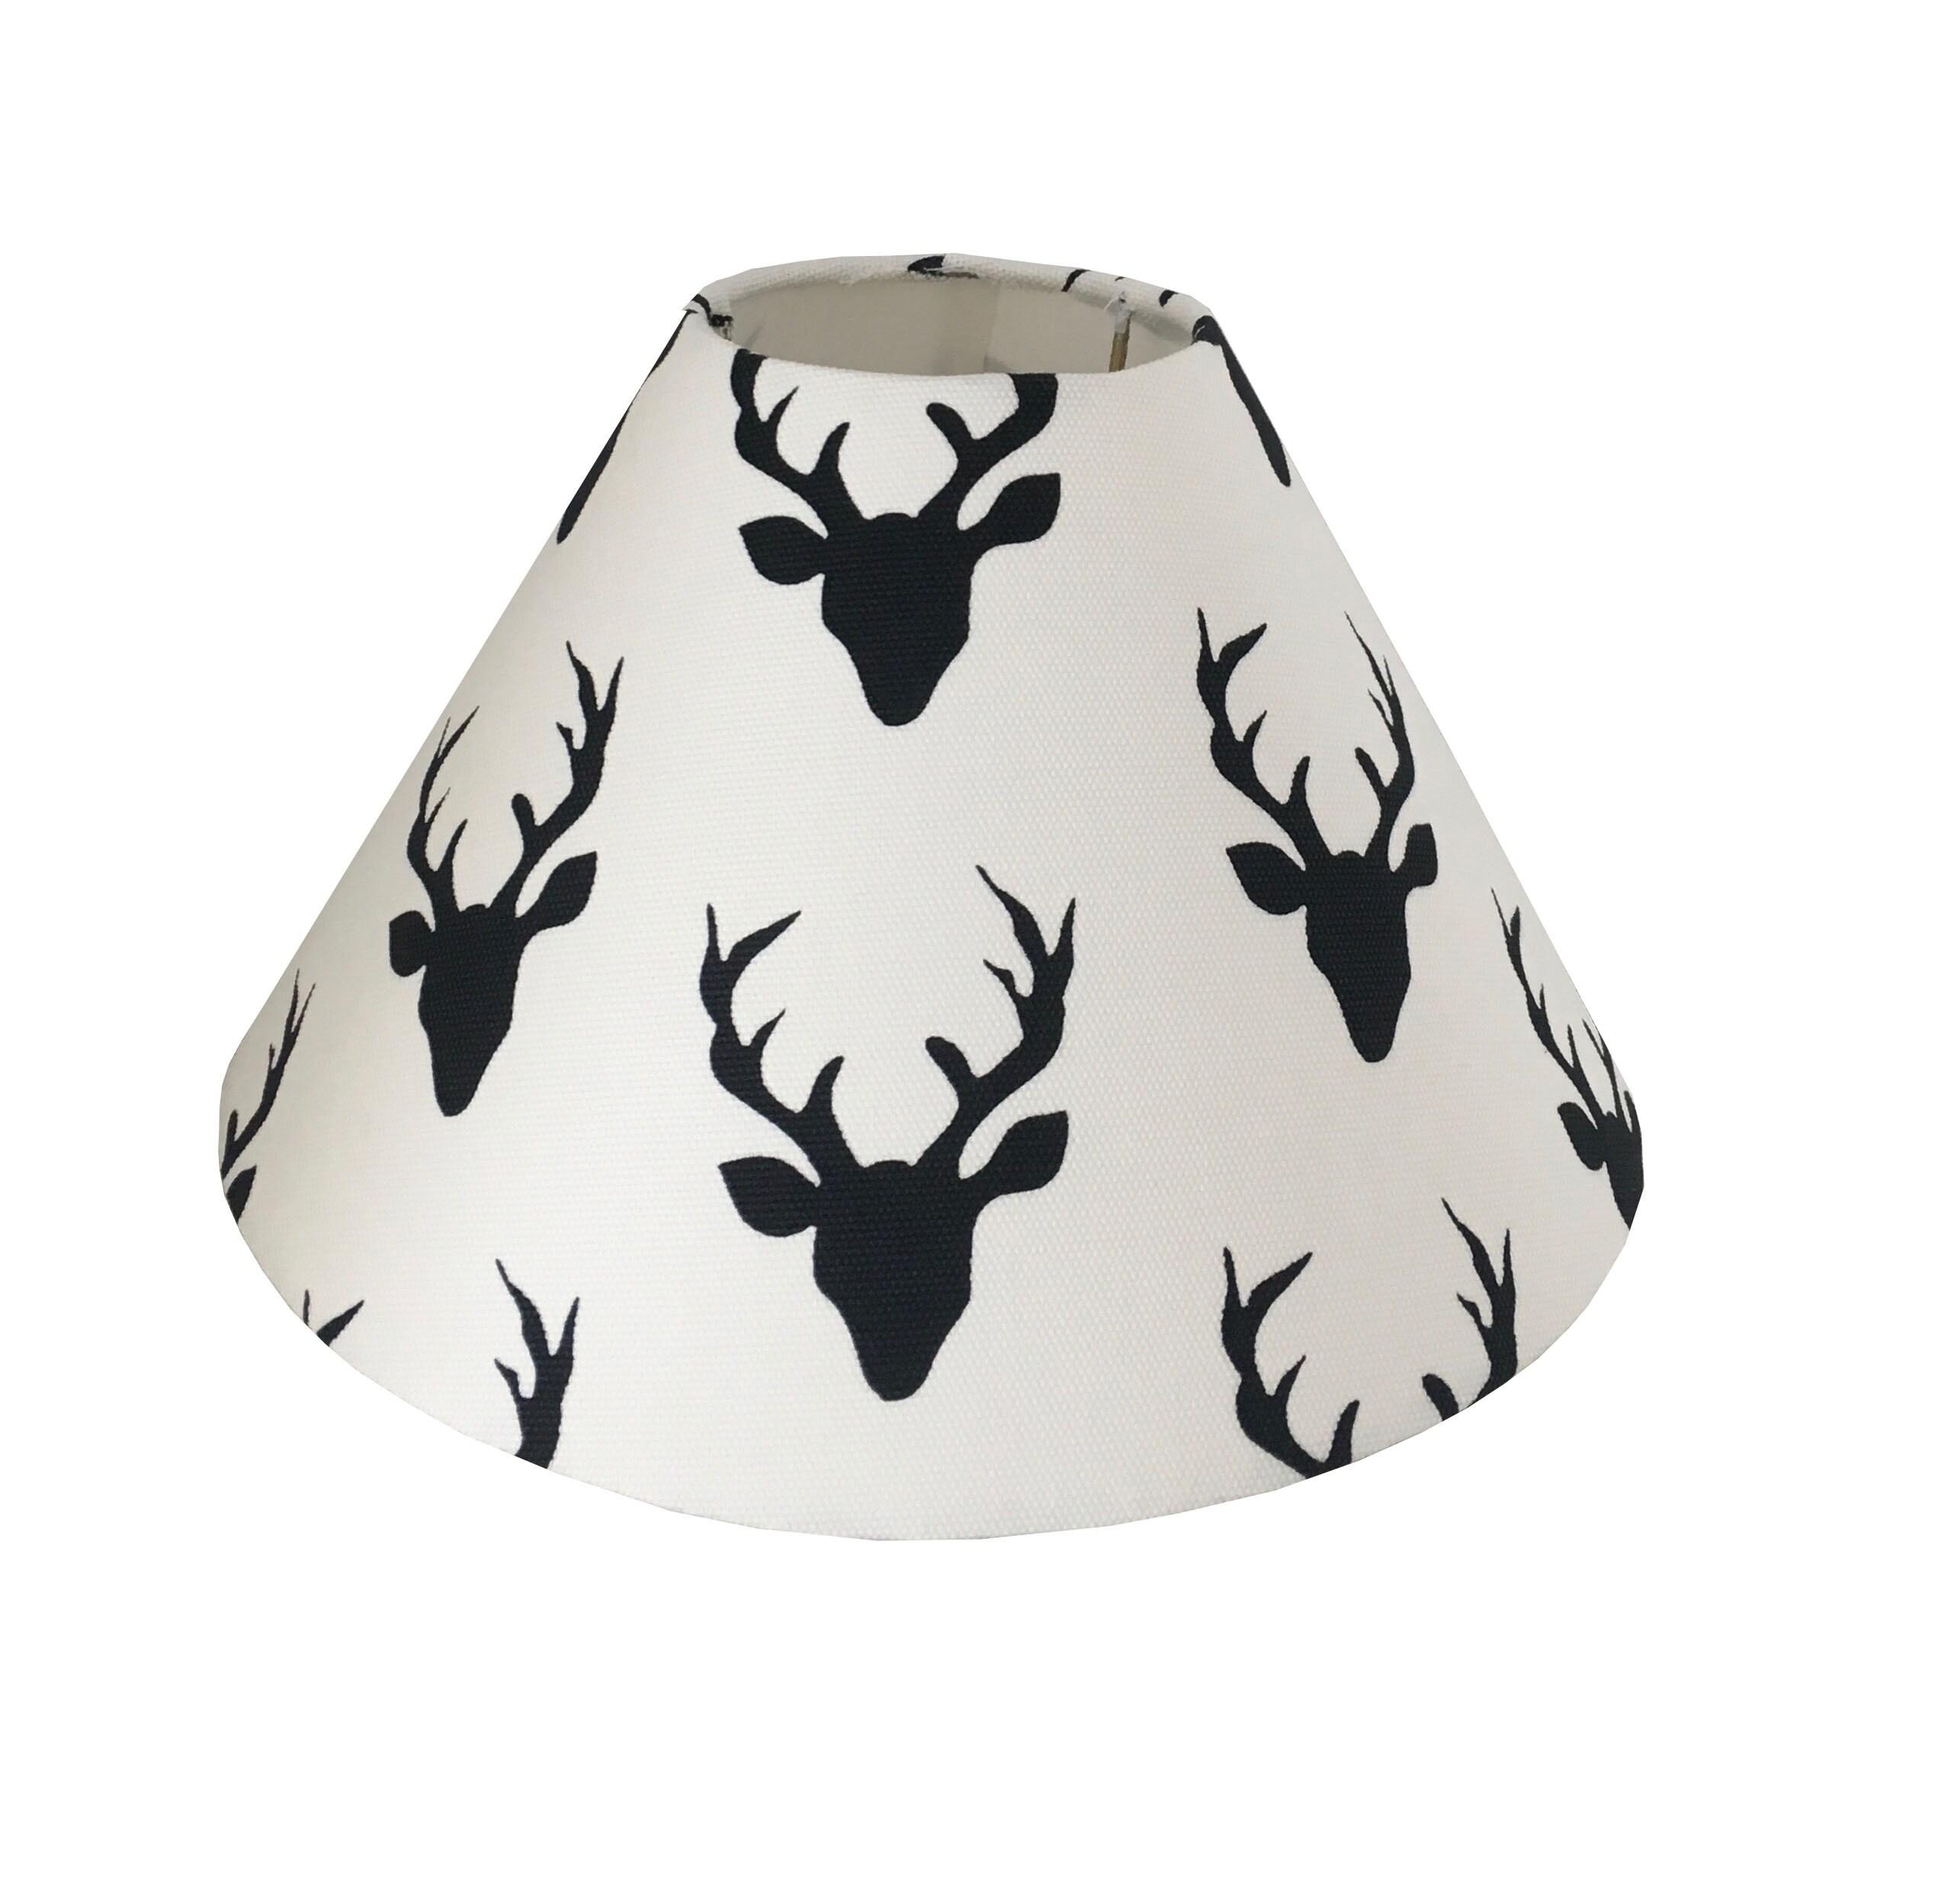 Room Lampshade Black Deer White Lamp Kids Shade Woodland SVGLpqjMzU